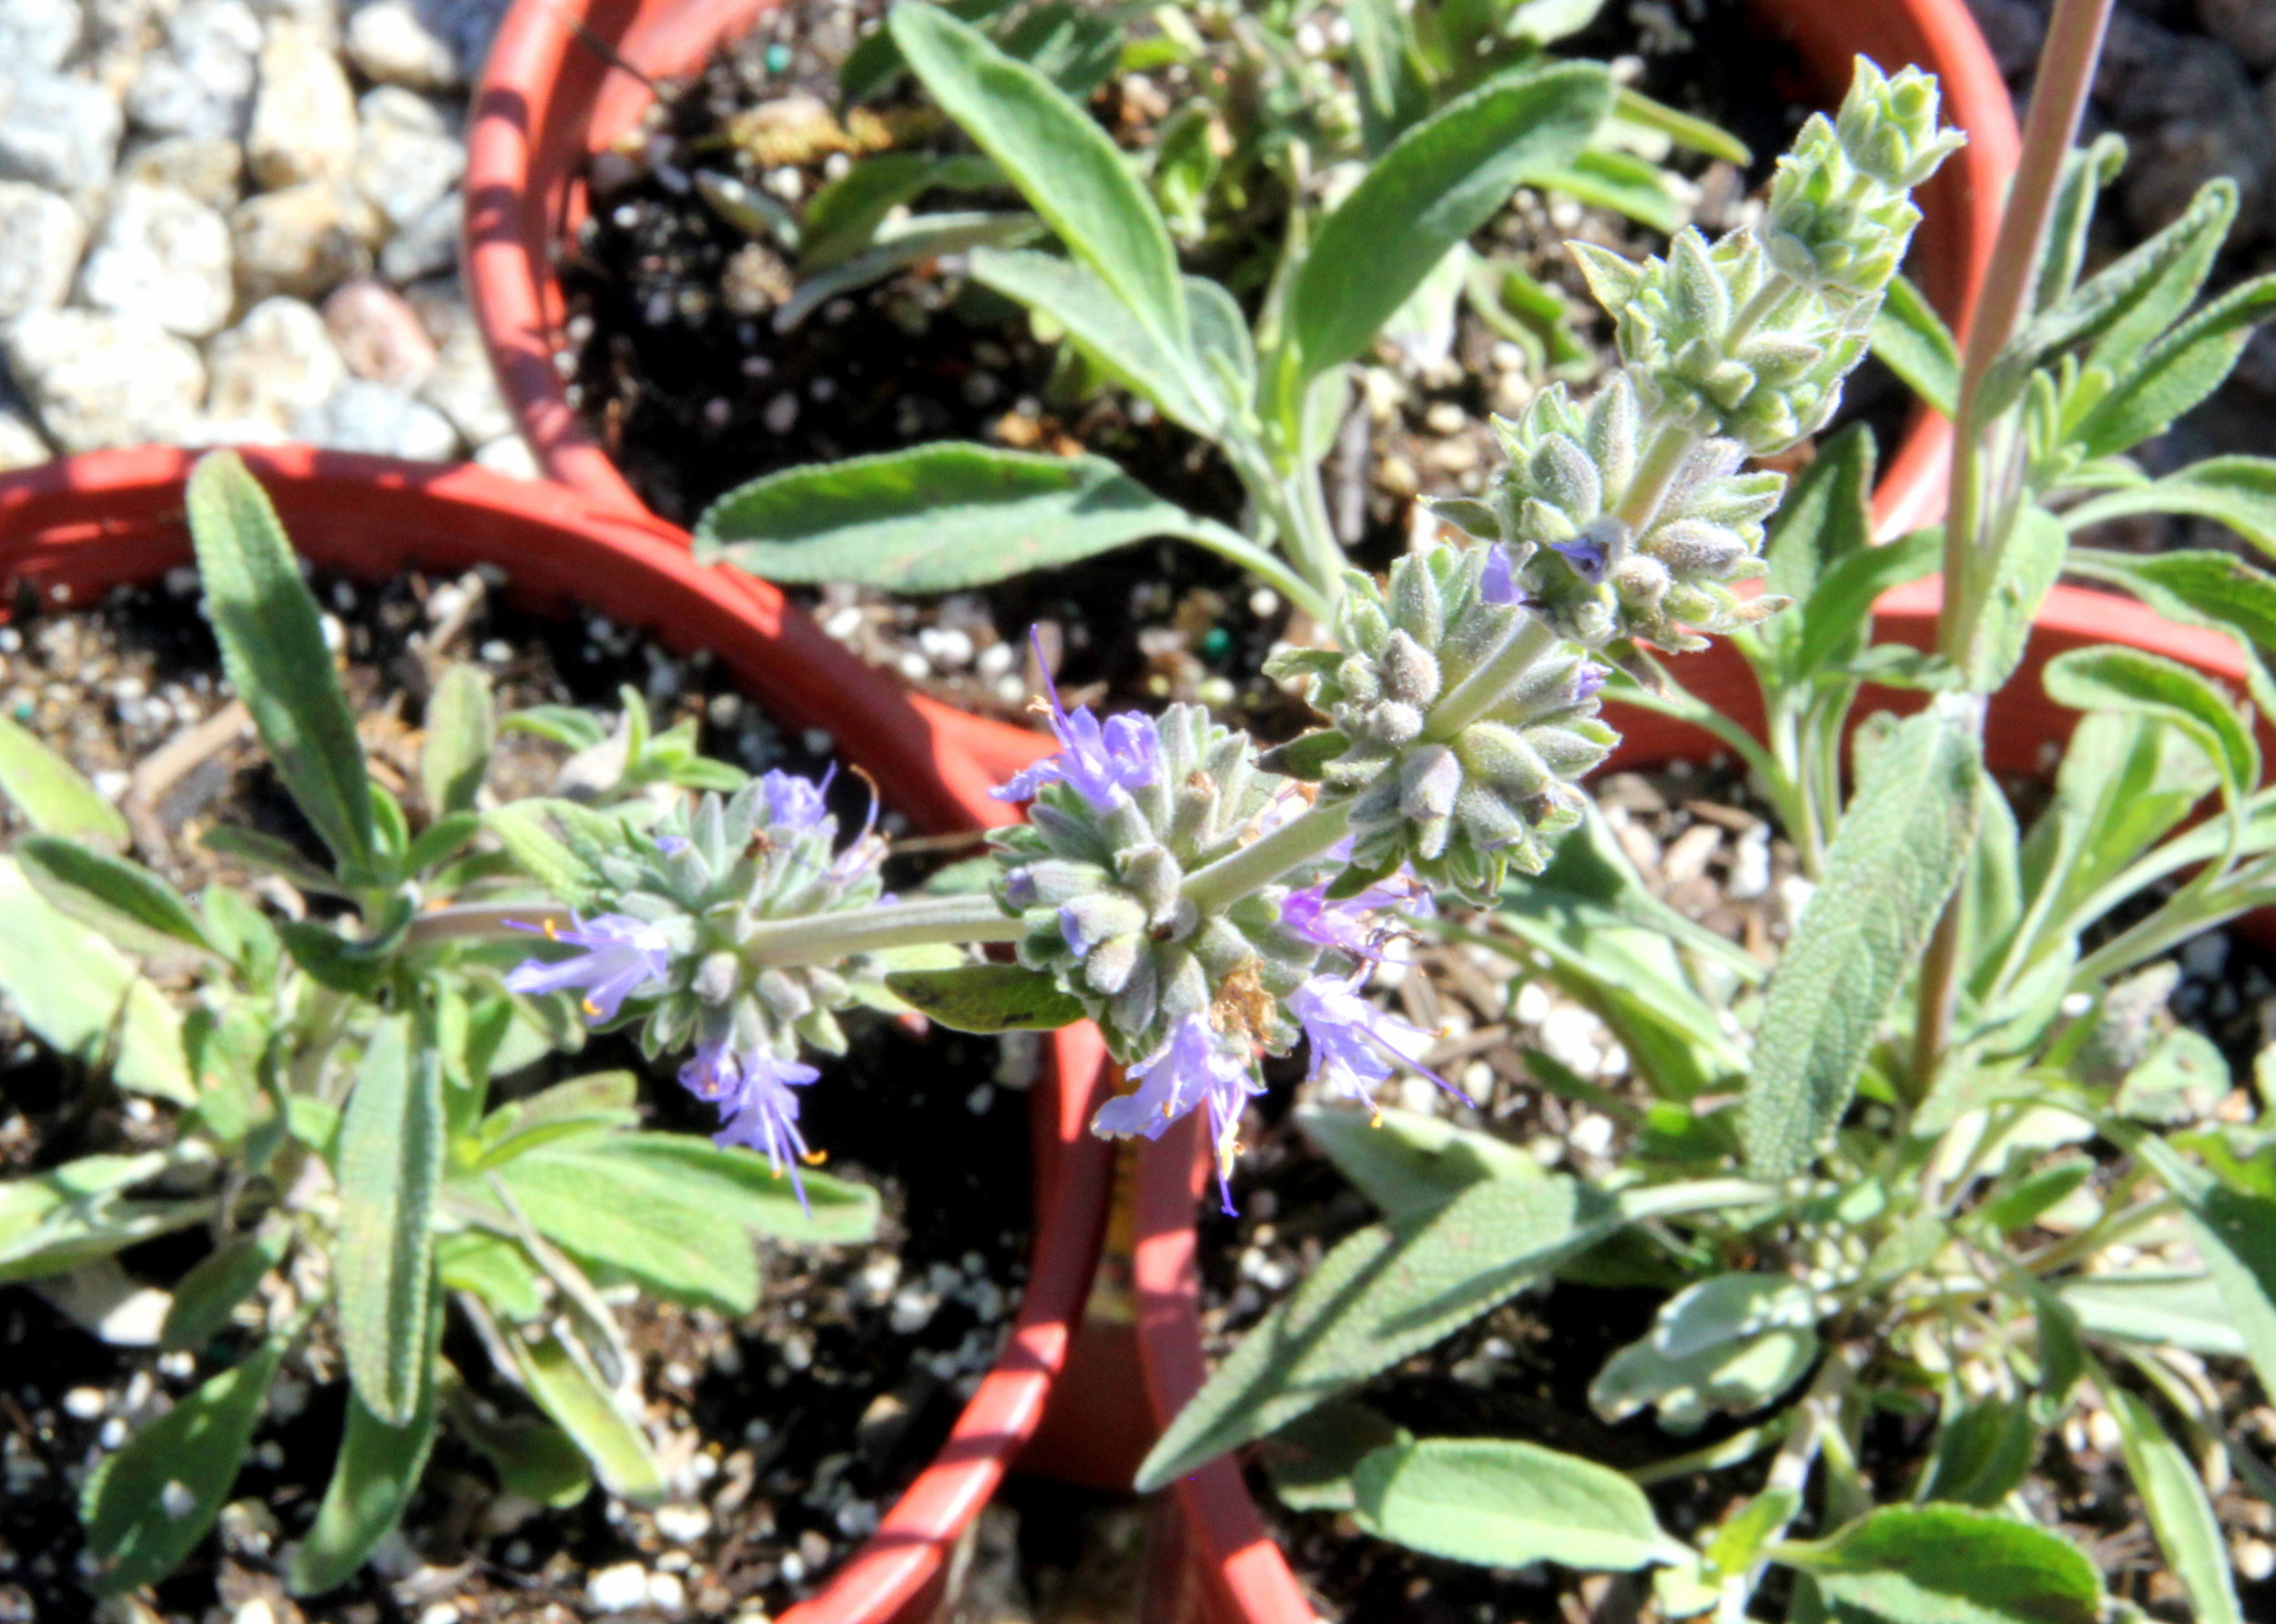 Salvia_bees_bliss (2).JPG